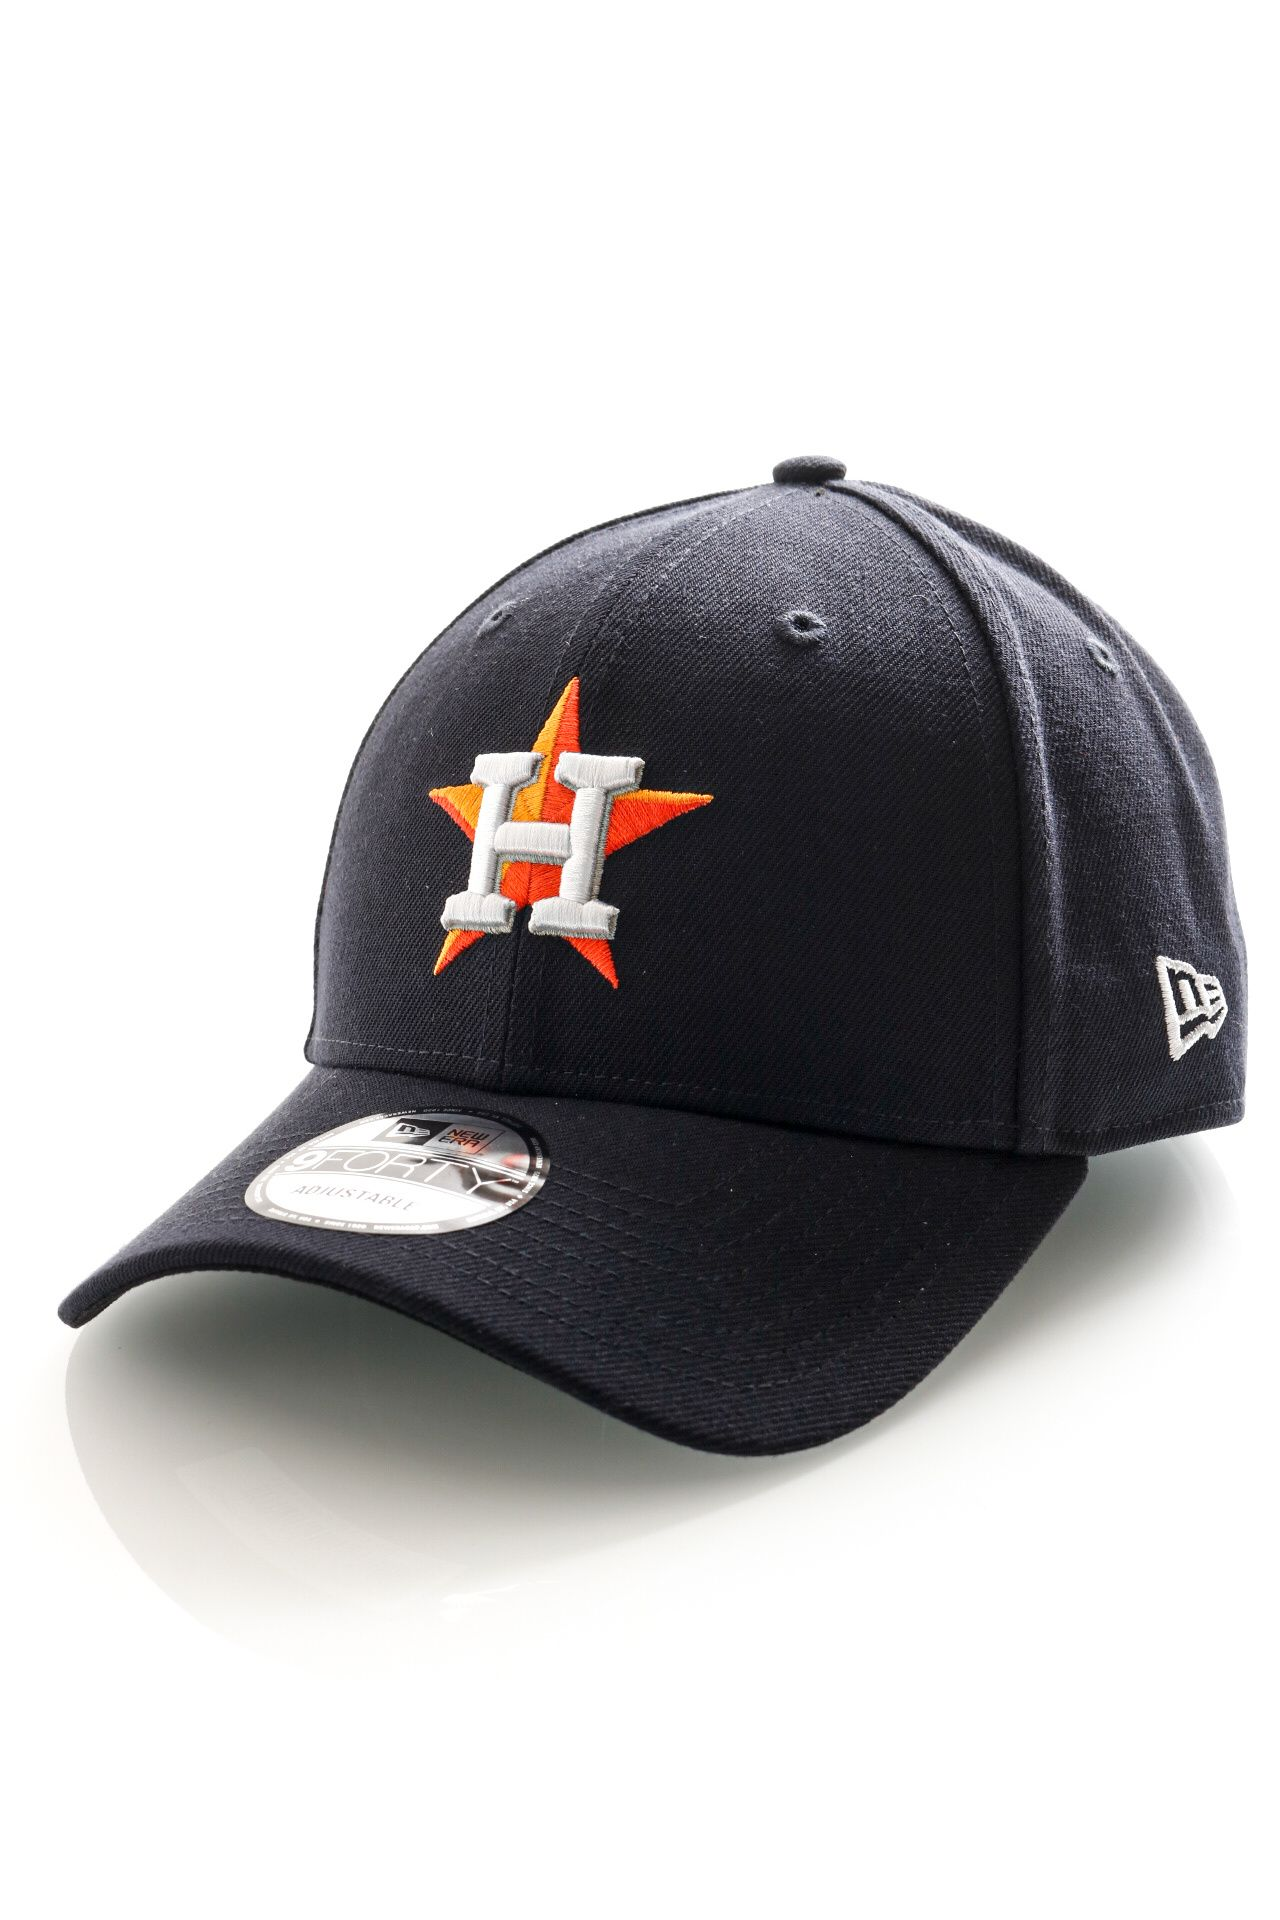 Afbeelding van New Era Dad Cap Mlb The League Mlb The League Houston Astros Official Team Colour 10761331